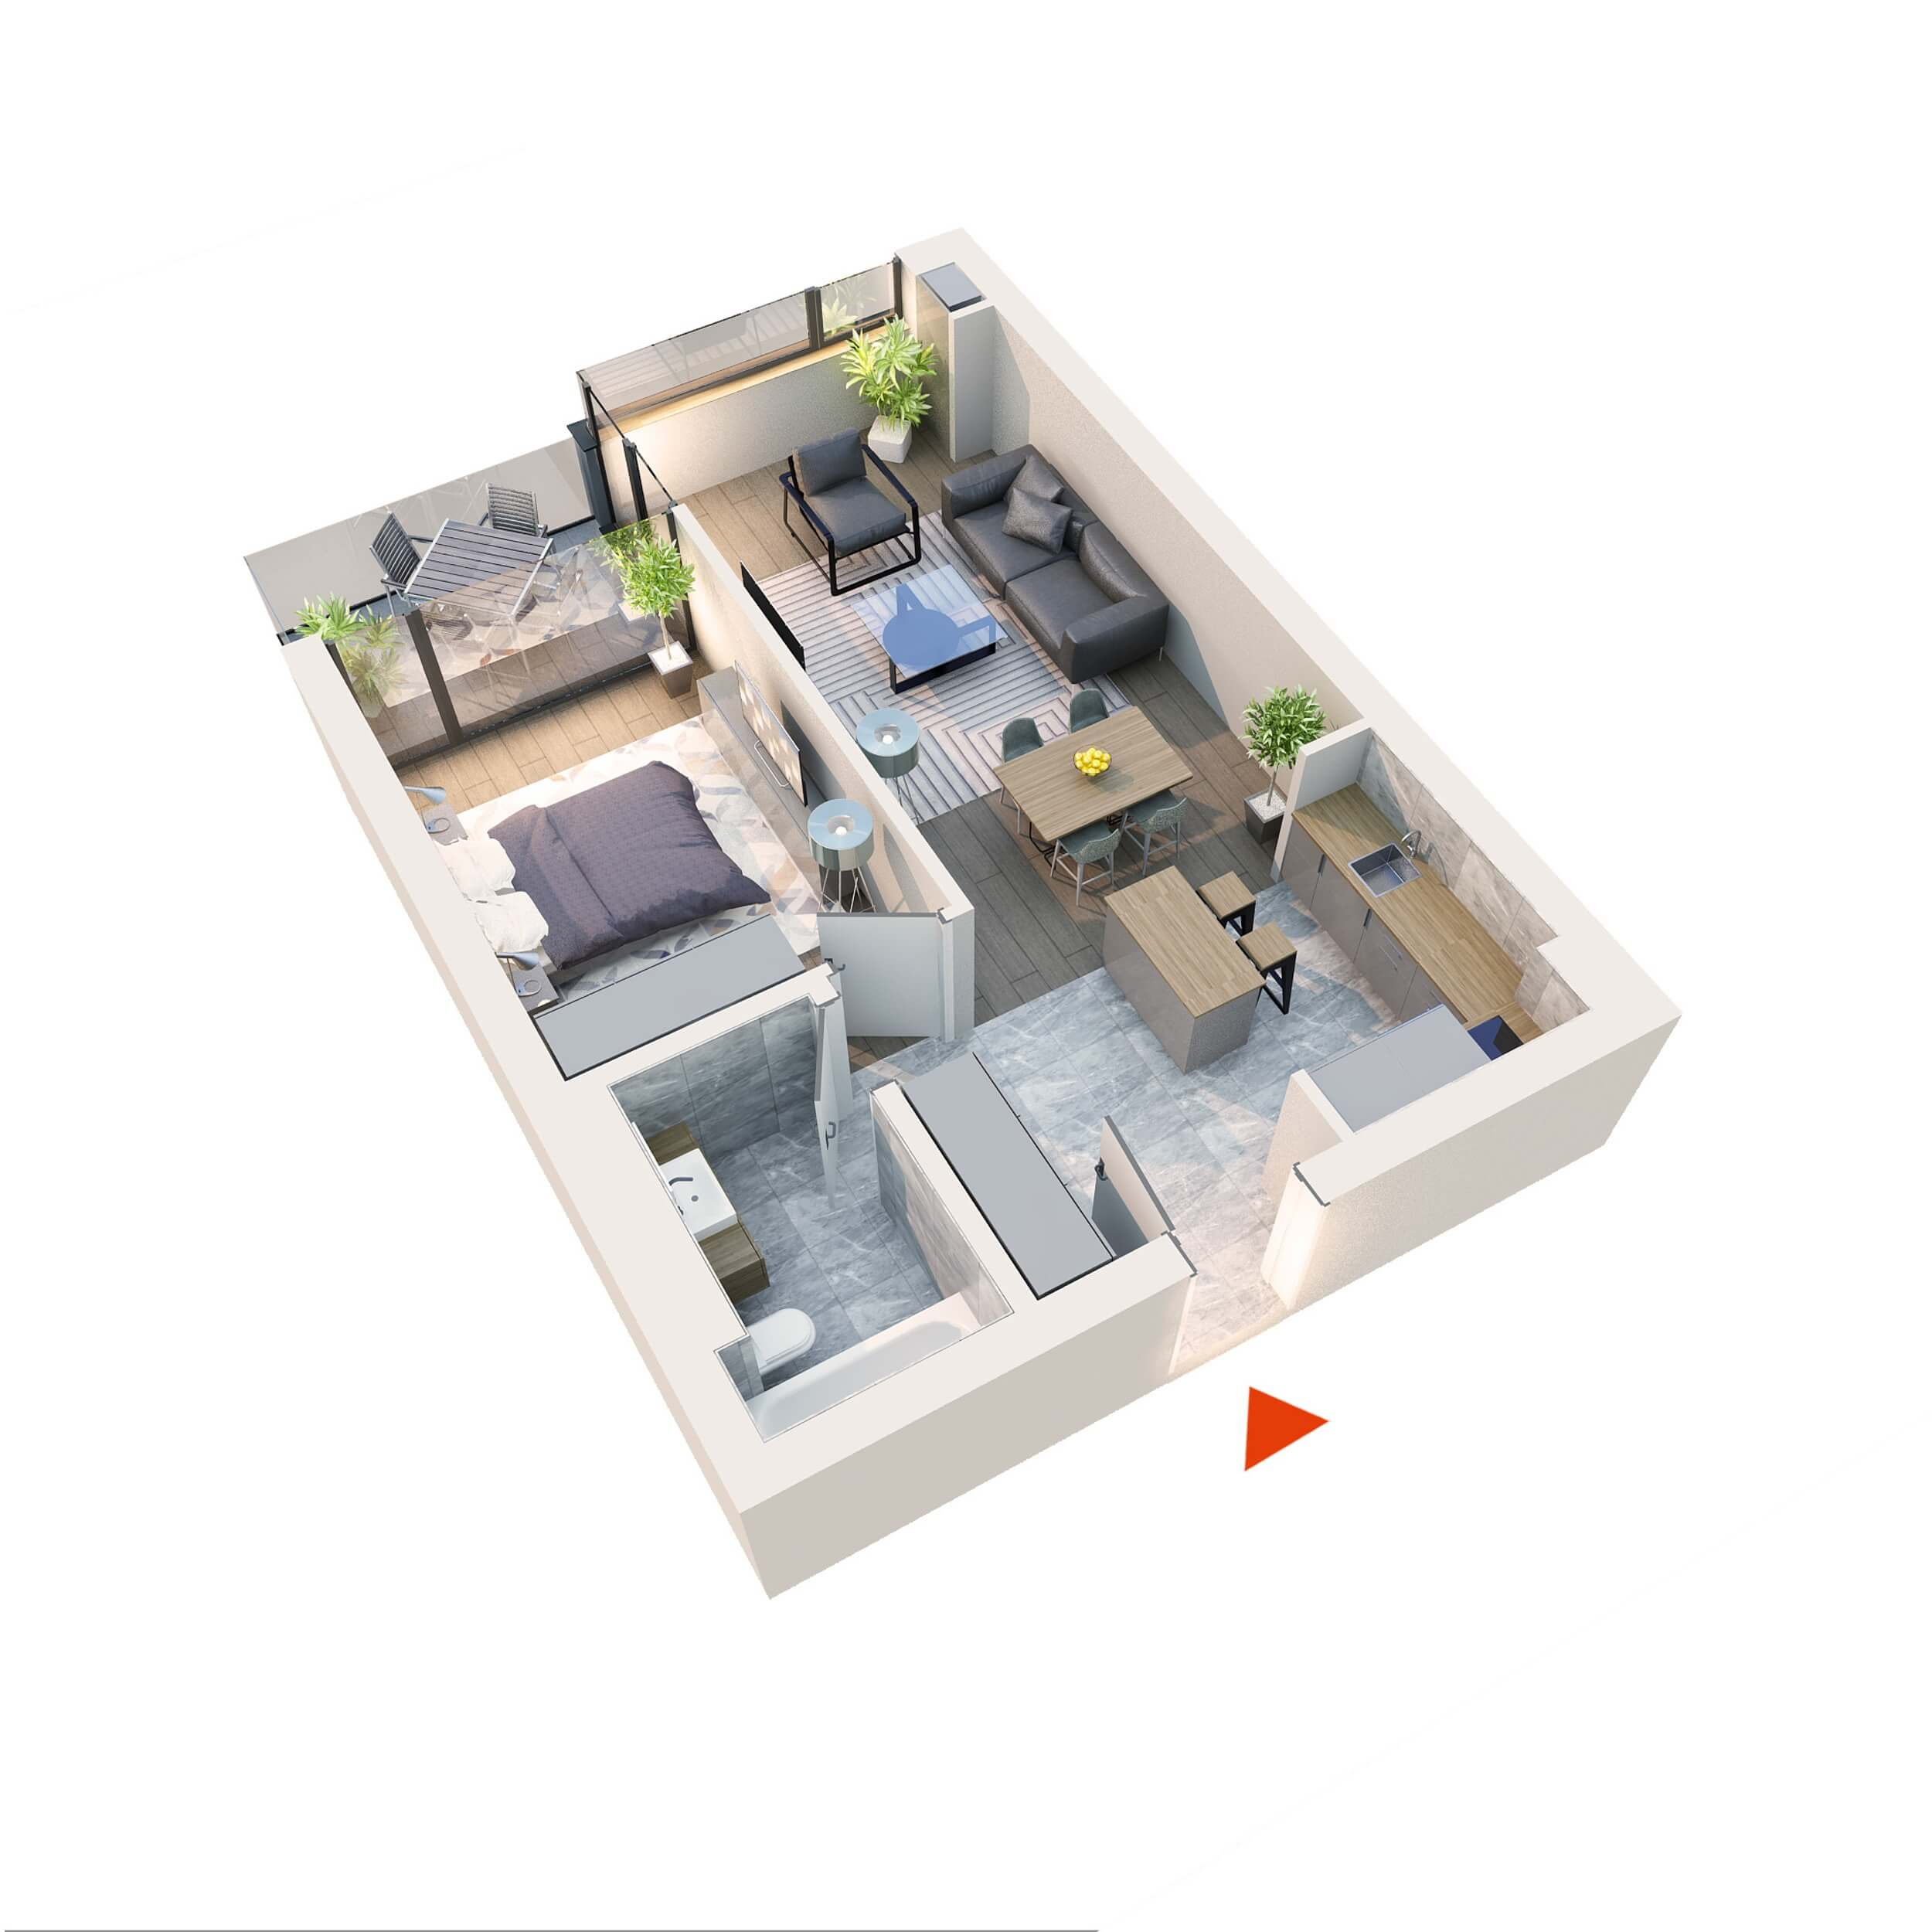 Apartament 2 camere tip 2D1.1 Logie | Etaj 1-5 | Corp C7 | Faza 2